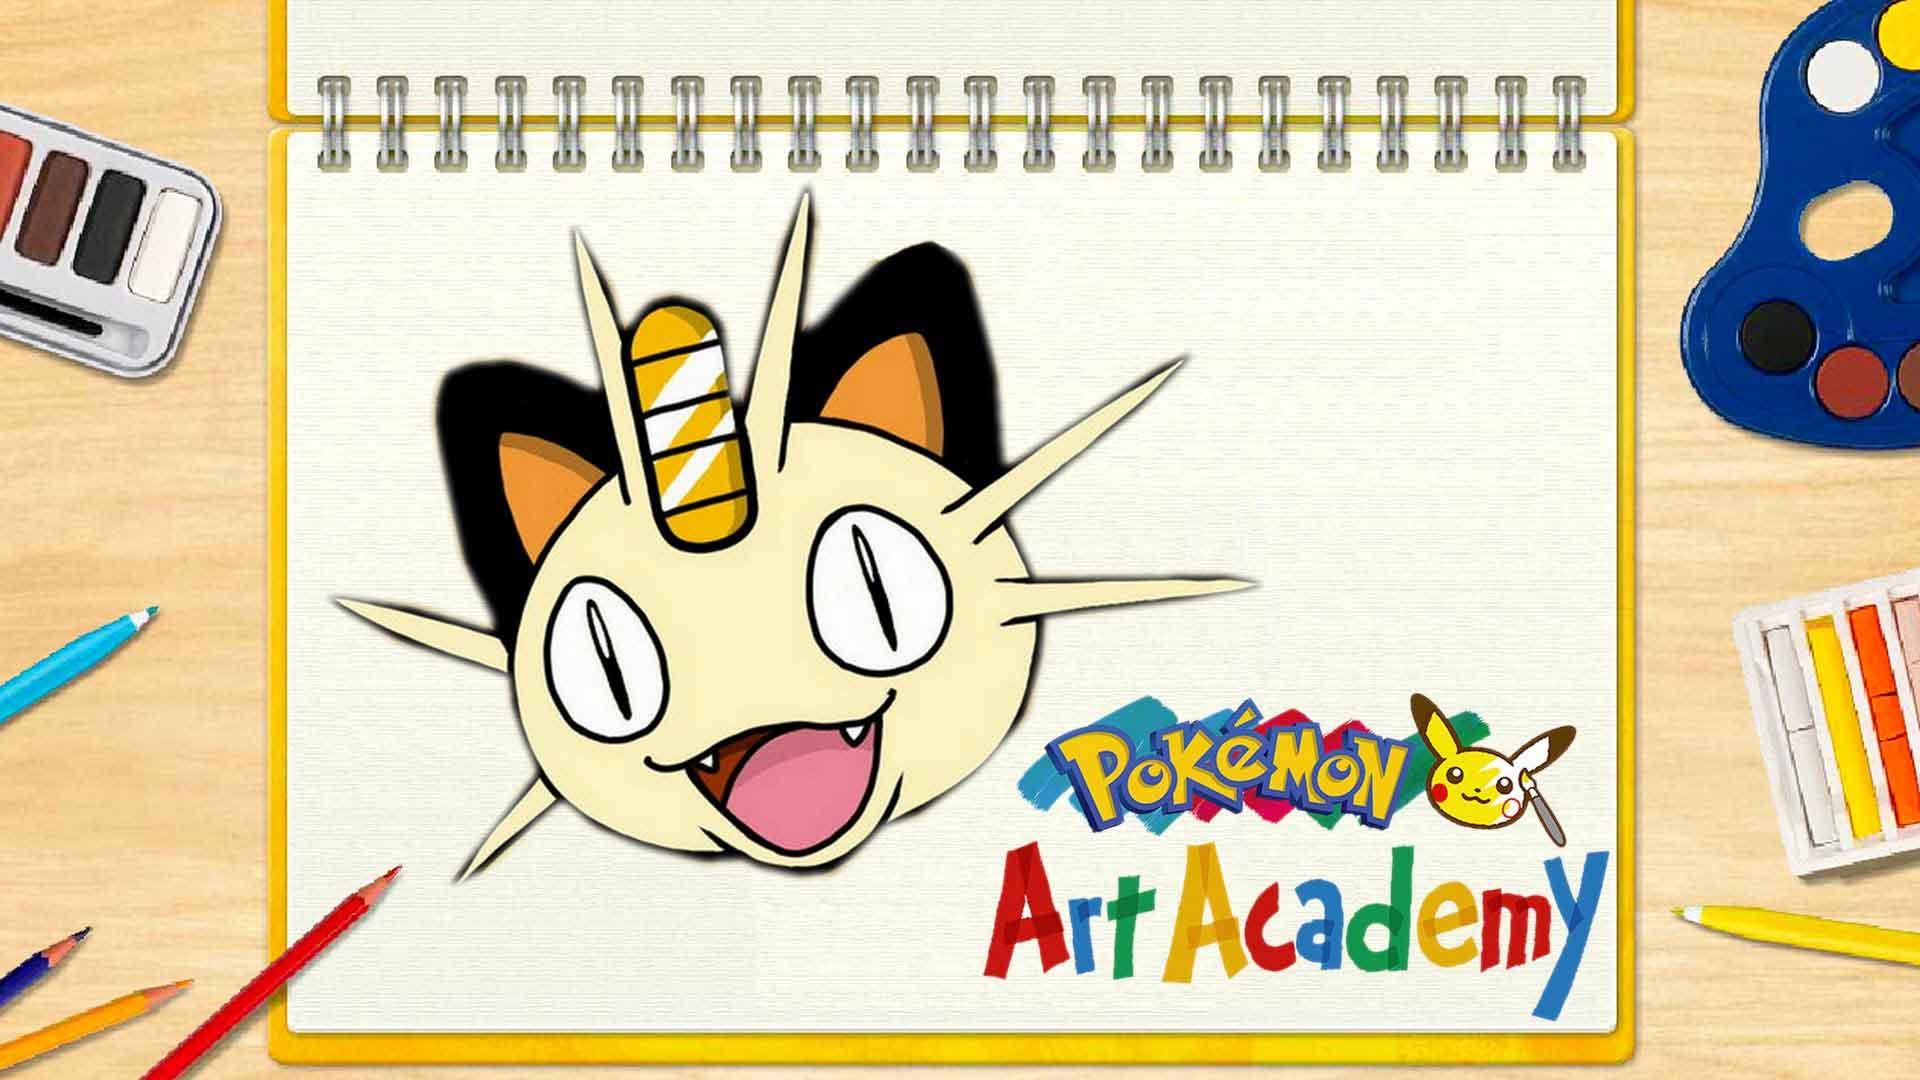 Pokemon-Art-Academy_3.jpg